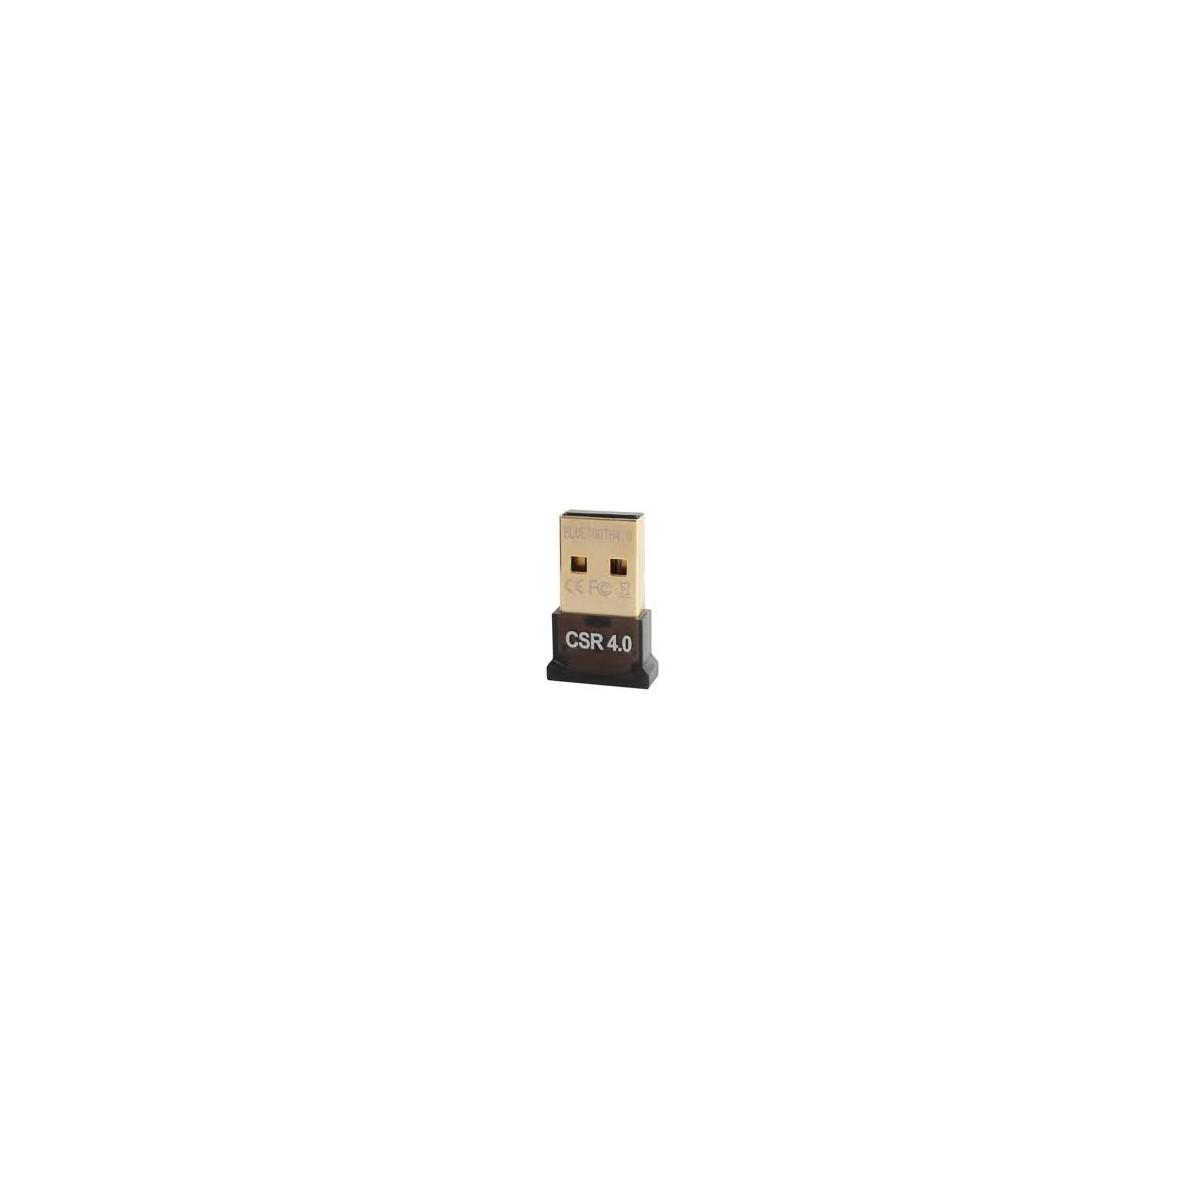 Fanvil NEX BT20 Dongle USB Bluetooth per l'interconnessione a cuffie Bluetooth.